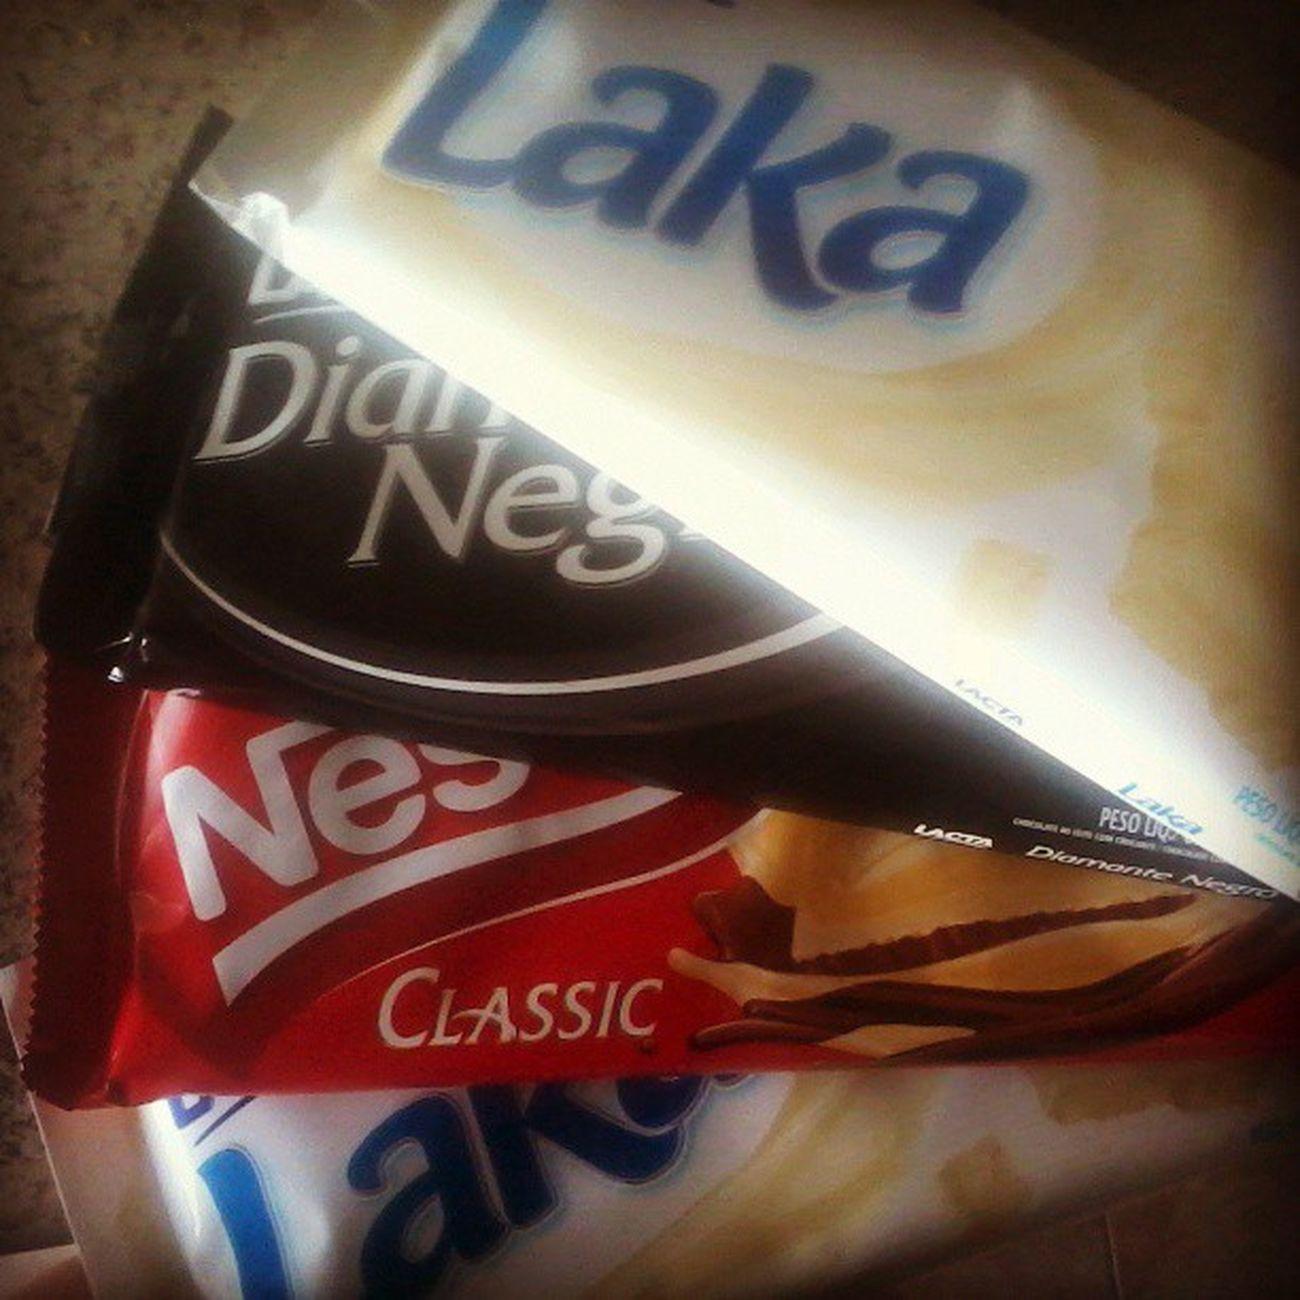 Pascoa, aaah pascoa.. Love Chocolate Chocolover Pascoa Happy Easter Laka Diamantenegro Duo Blackdiamond Lacta Nestle Classic Blackandwhite